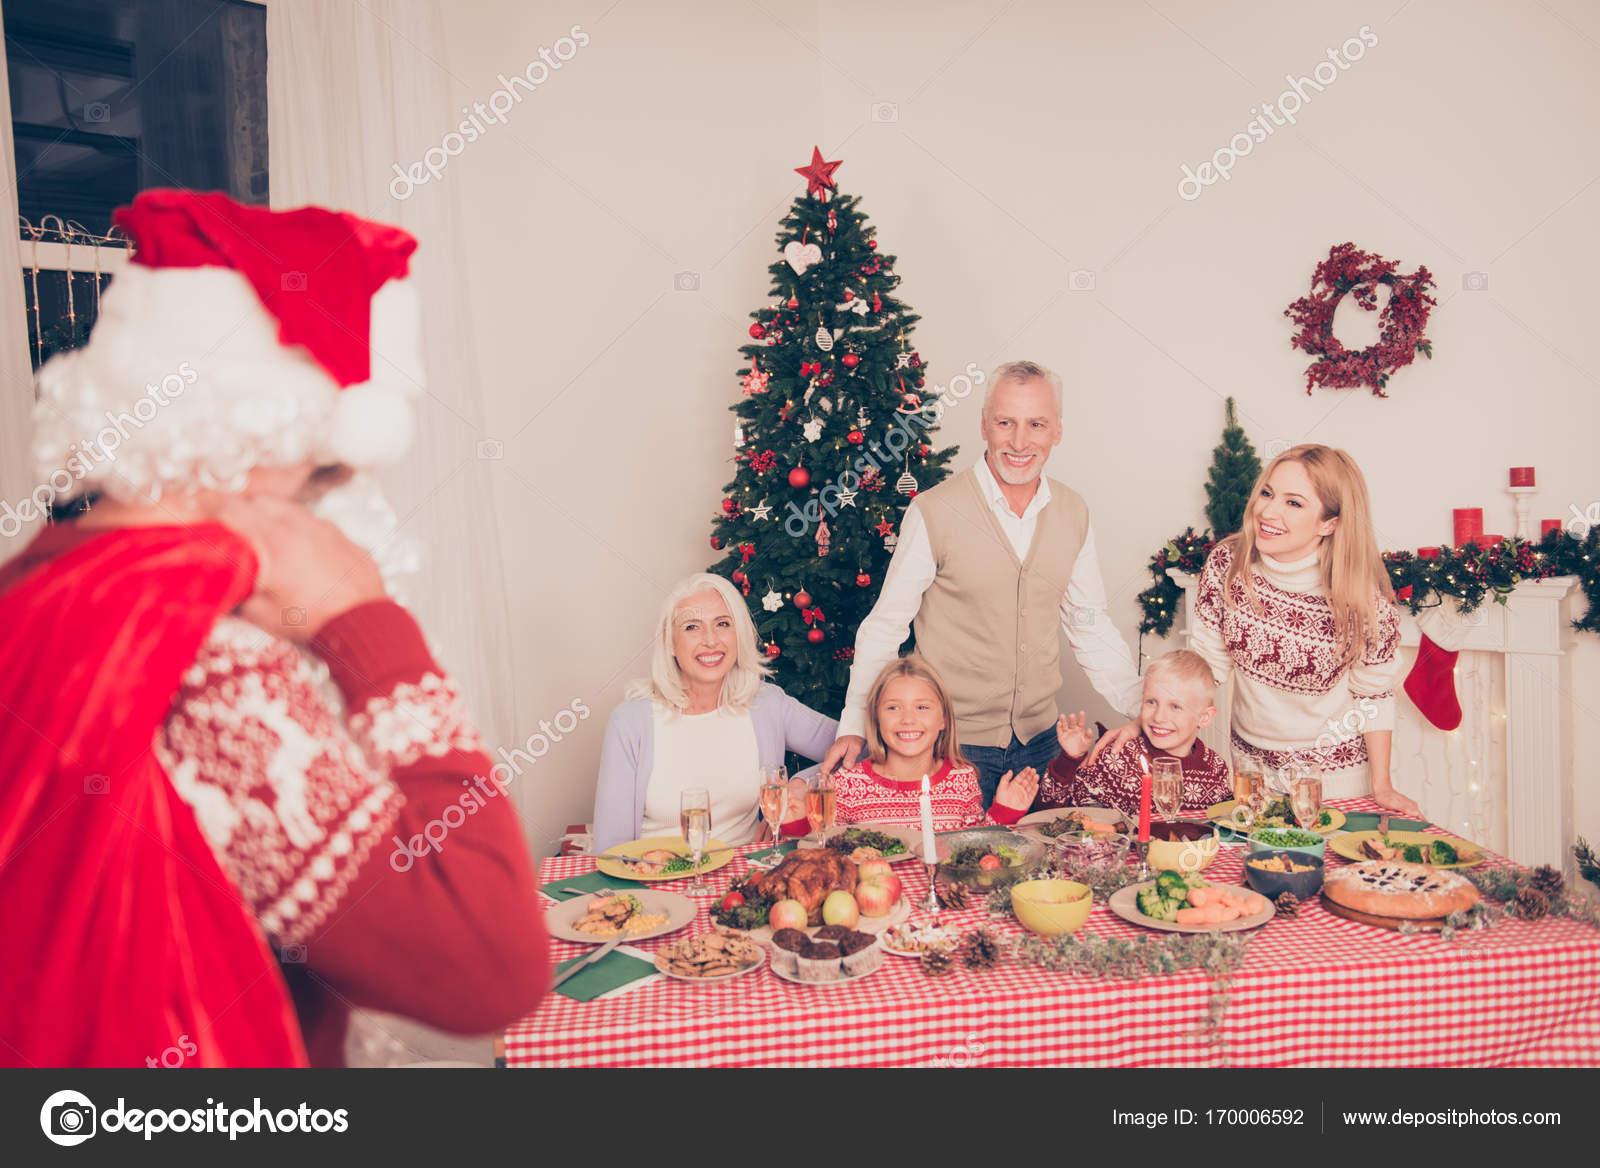 Ho ho ho! Santa came and brought presents gifts surprises! Cheer ...